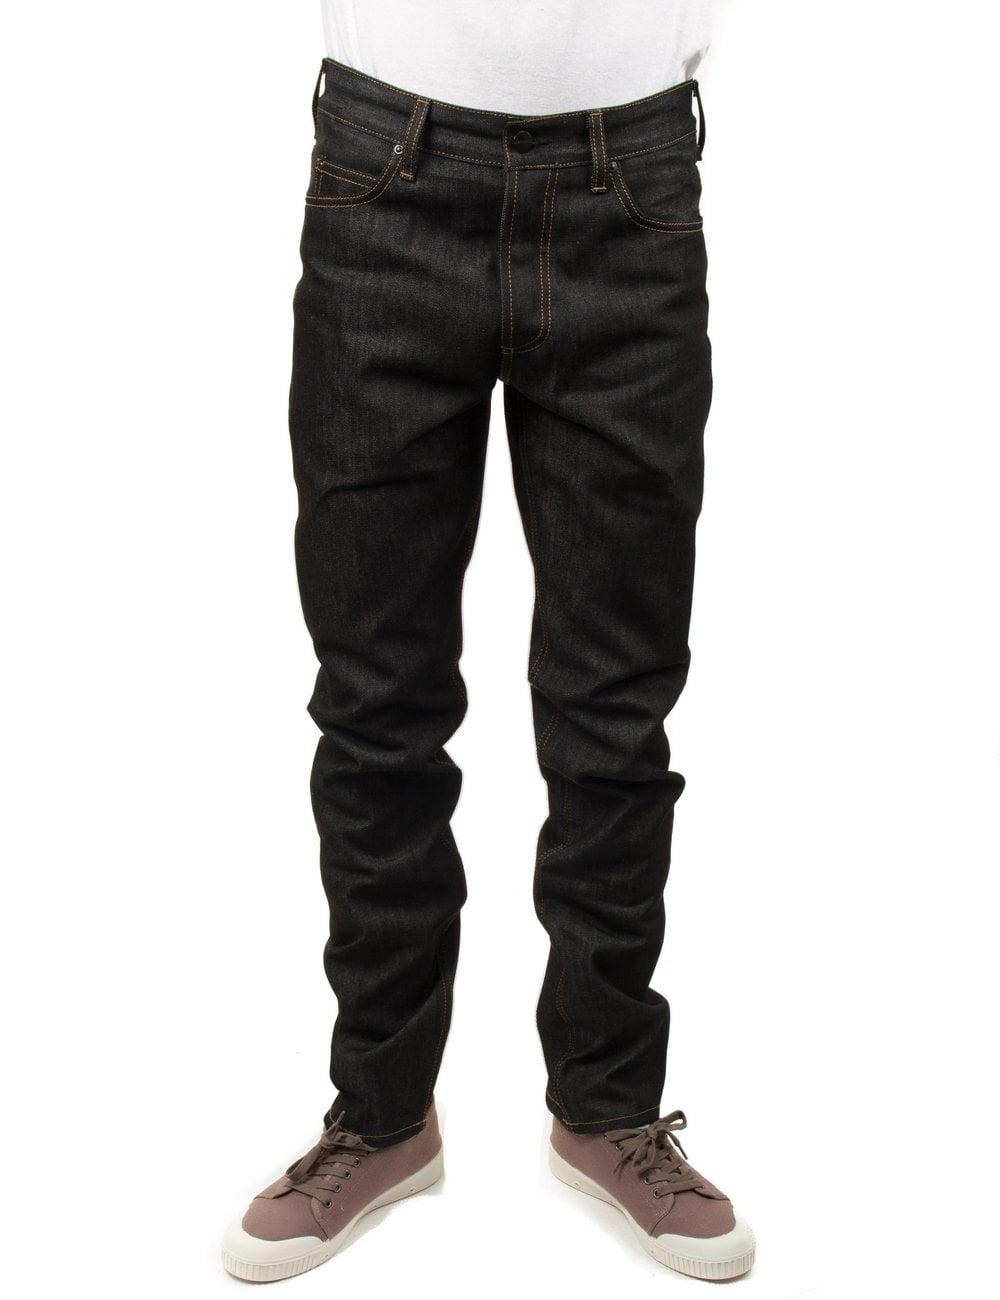 e35c4218 Carhartt WIP Texas Pant II - Black Rigid - Clothing from Fat Buddha Store UK